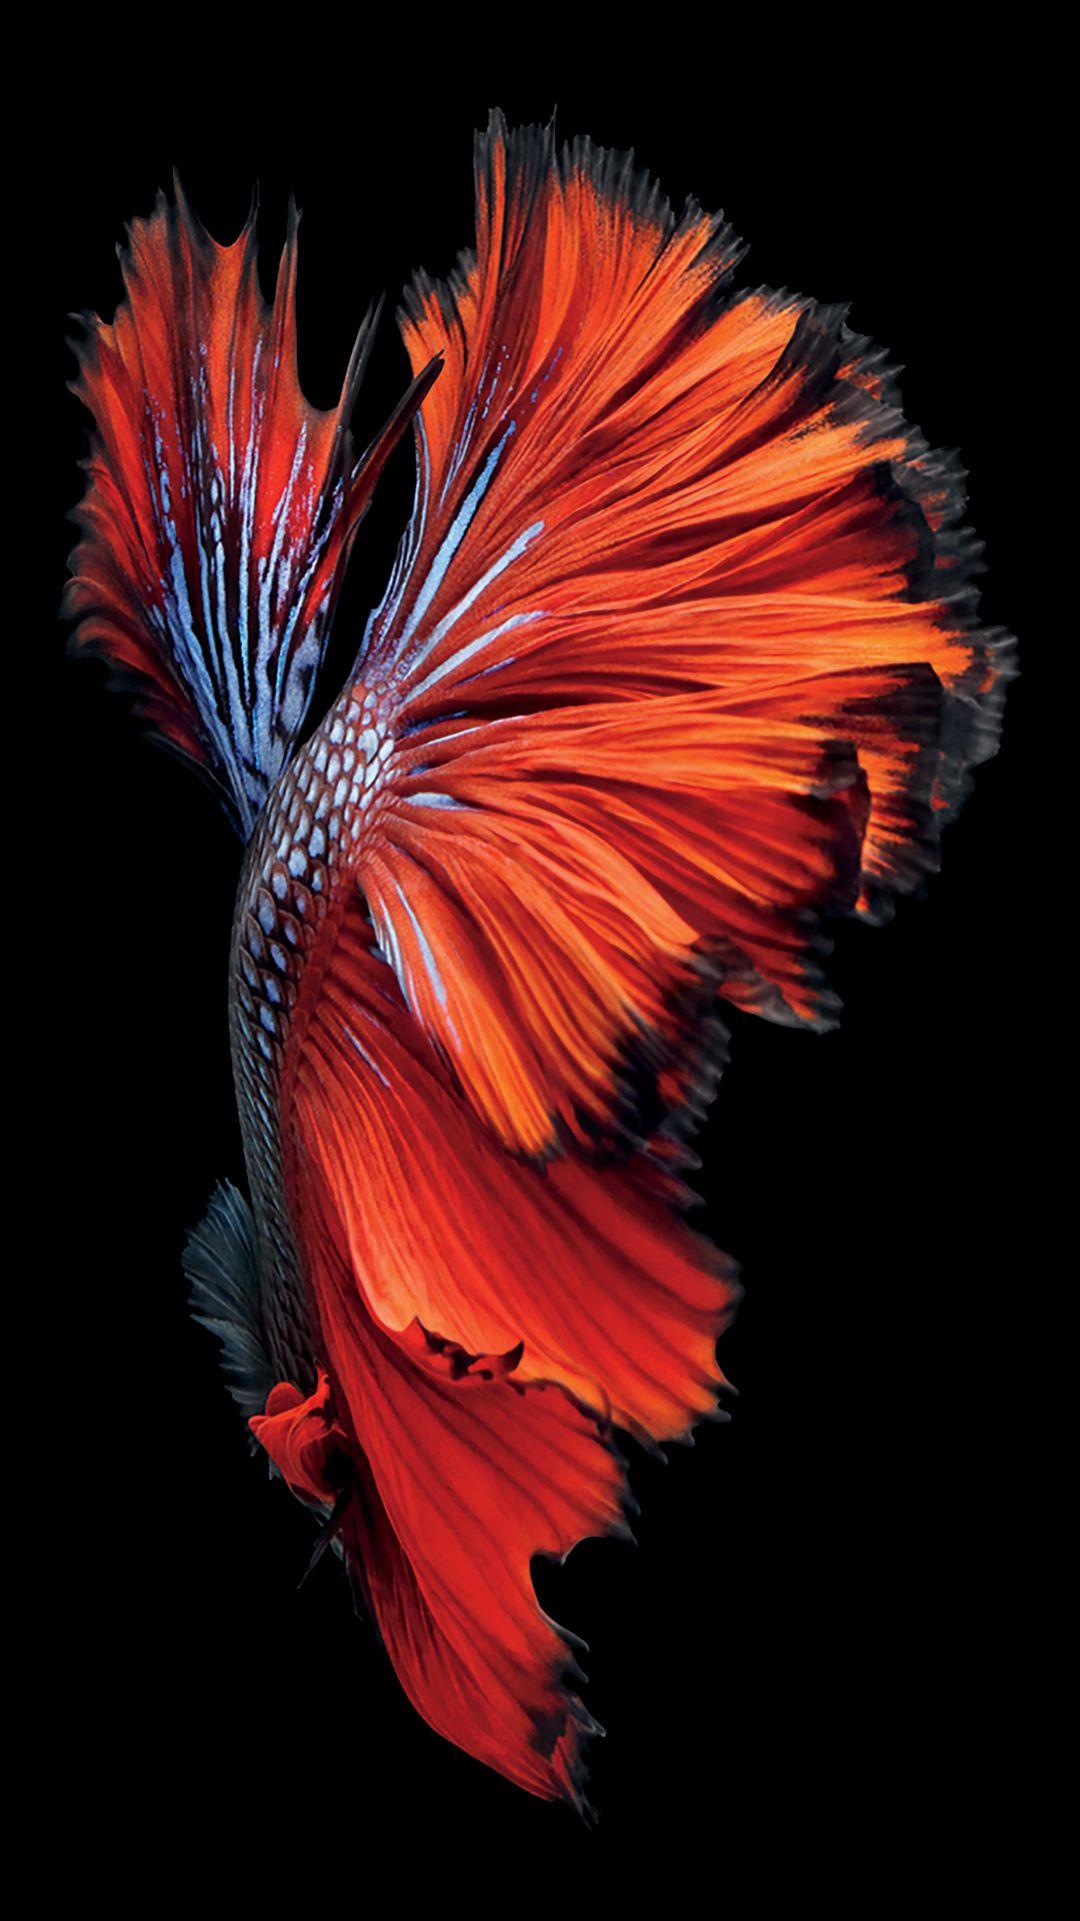 Iphone Betta Fish Live Wallpaper